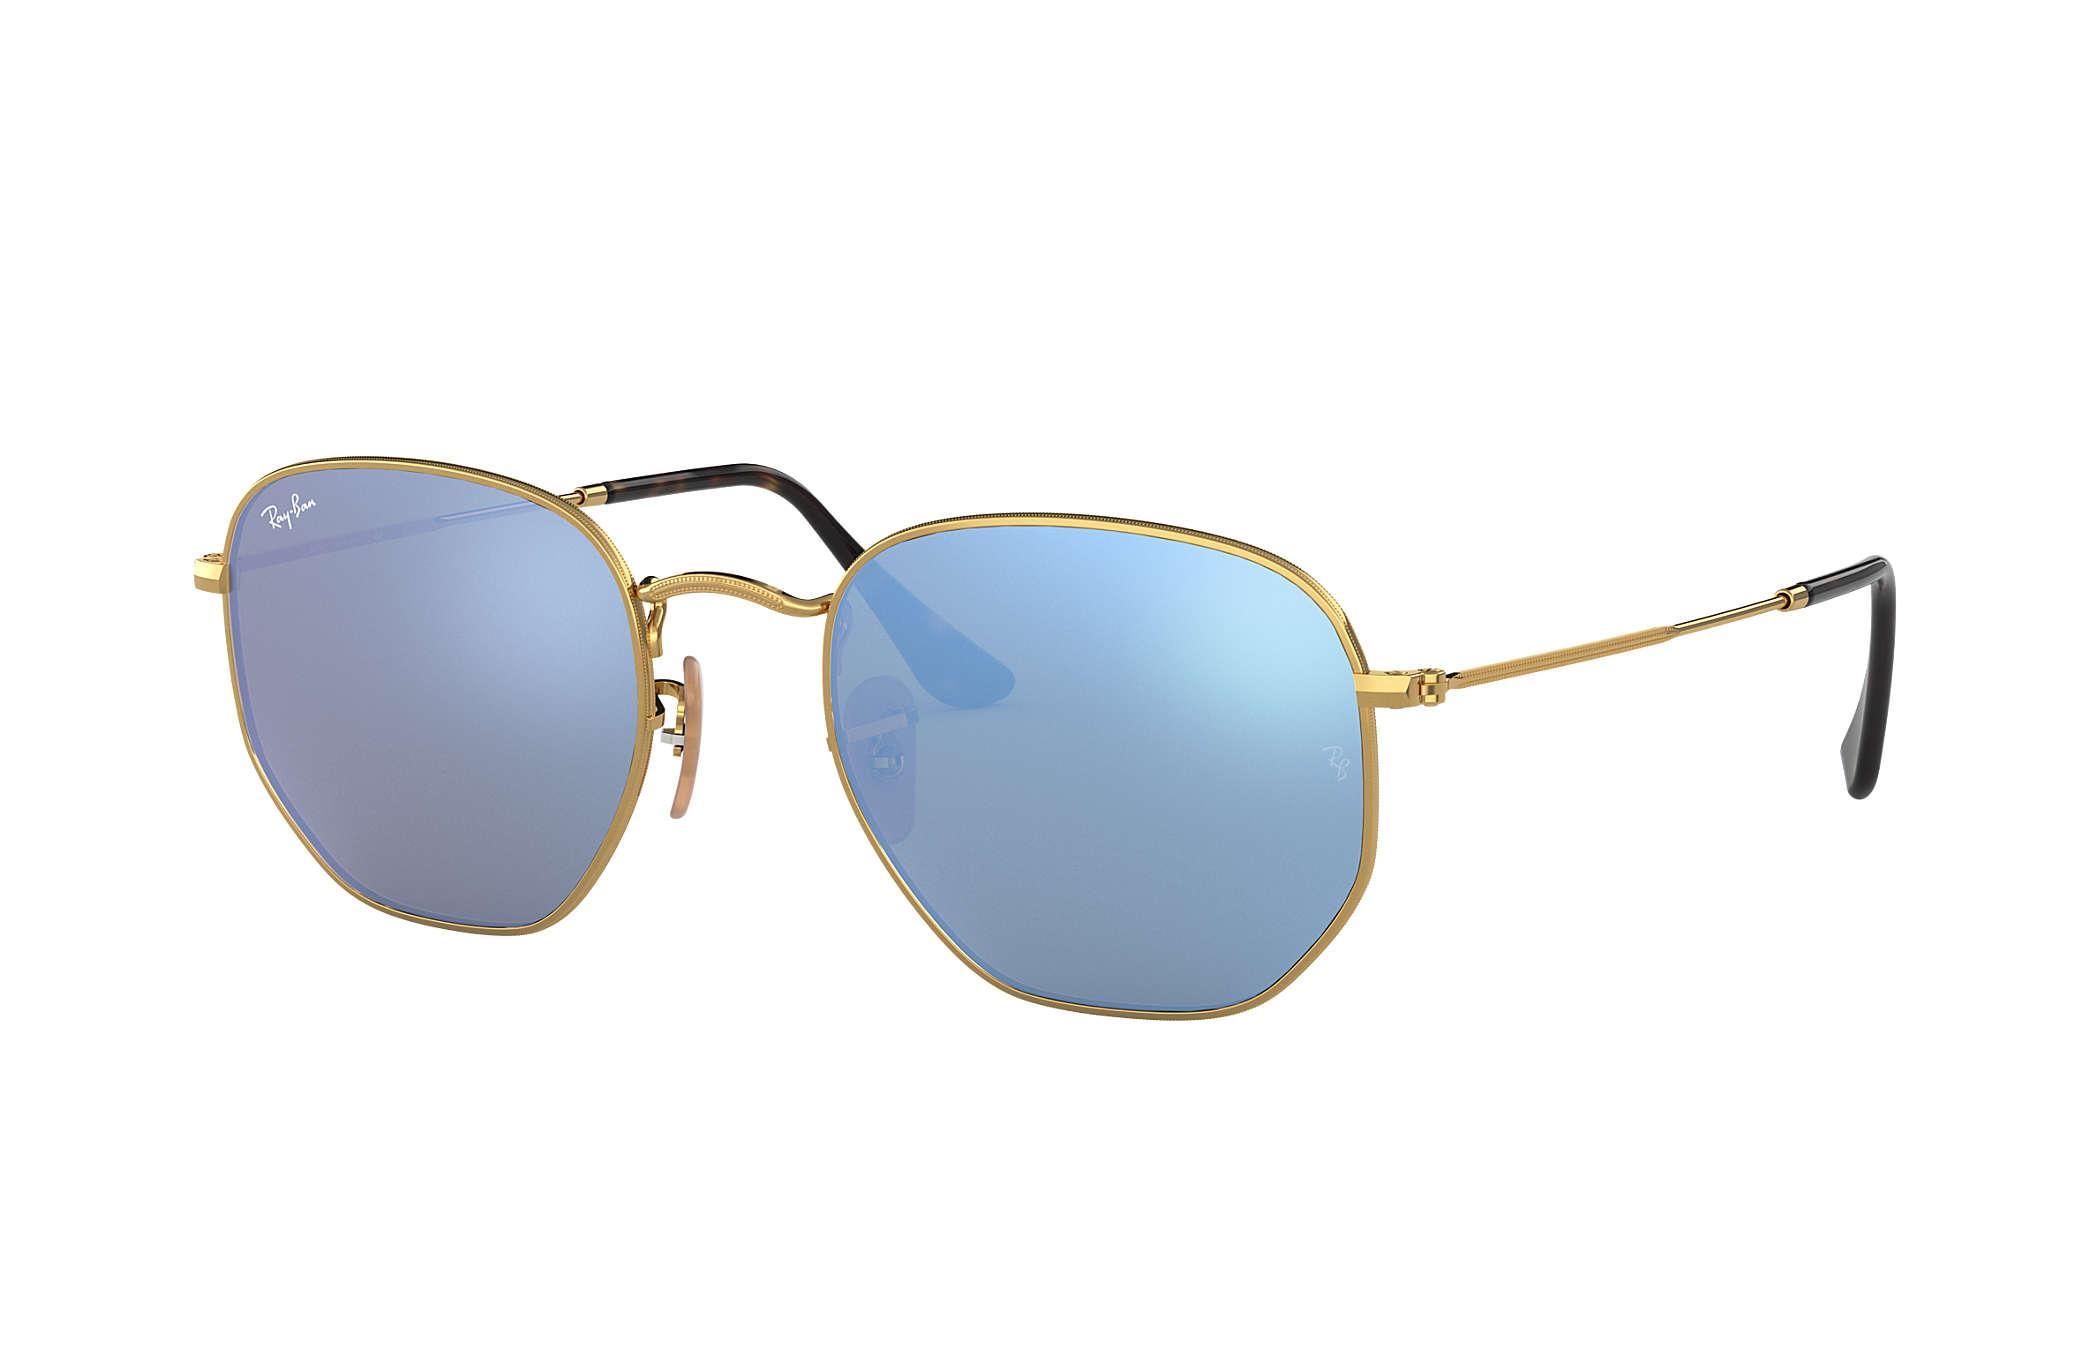 f73d2ffd14c72 Ray-Ban Hexagonal Flat Lenses RB3548N Gold - Metal - Light Blue ...